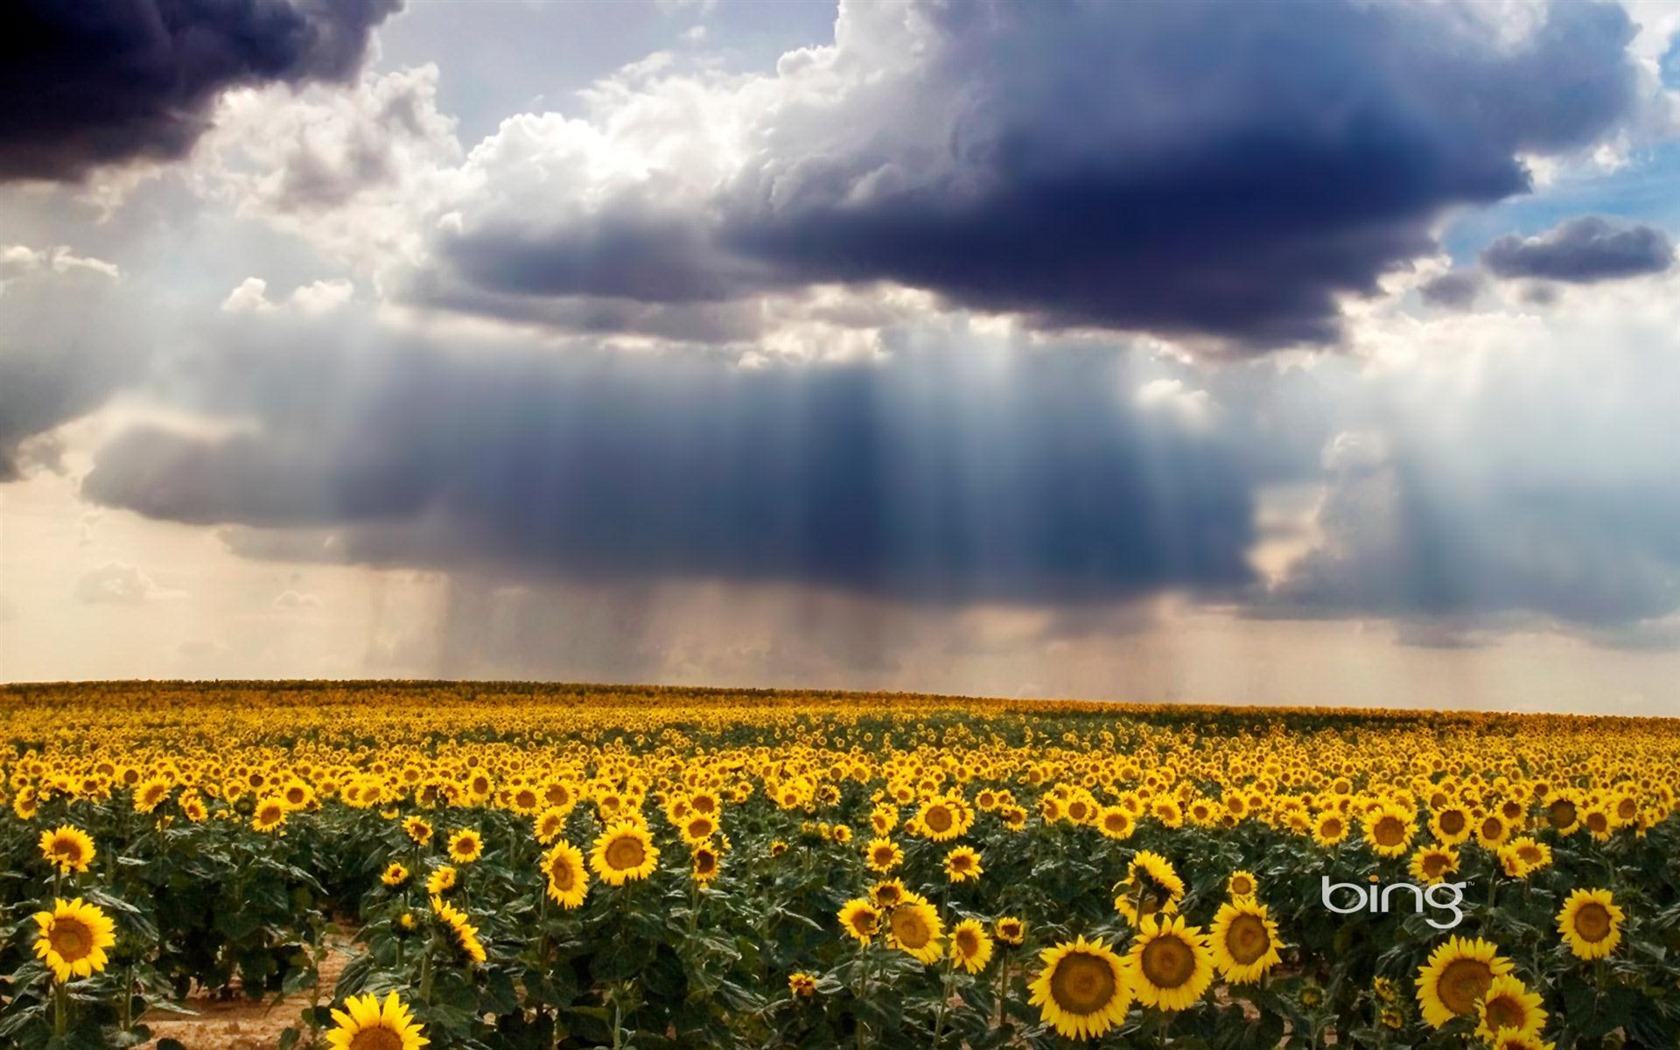 Bing Thmes champs de tournesols nuages Widescreen Wallpaper 1680x1050